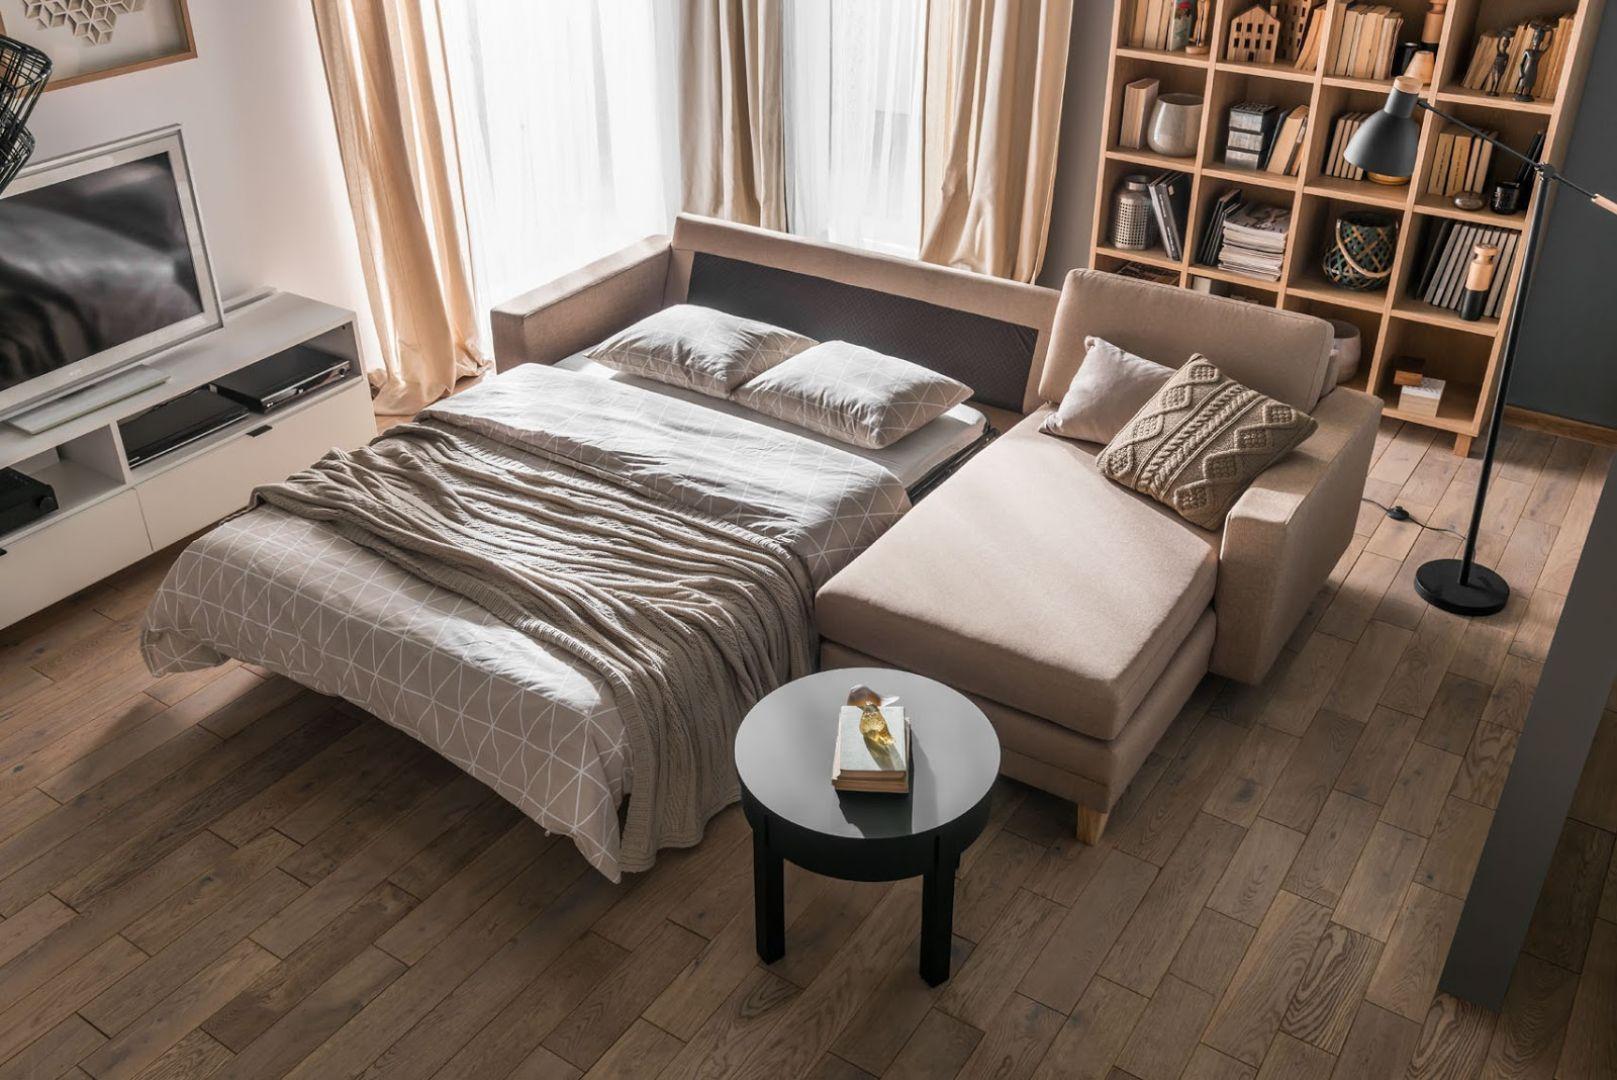 Narożnik z funkcją spania to popularny pomysł na miejsce do spania w salonie. Na zdjęciu model Liam marki VOX. Fot. VOX